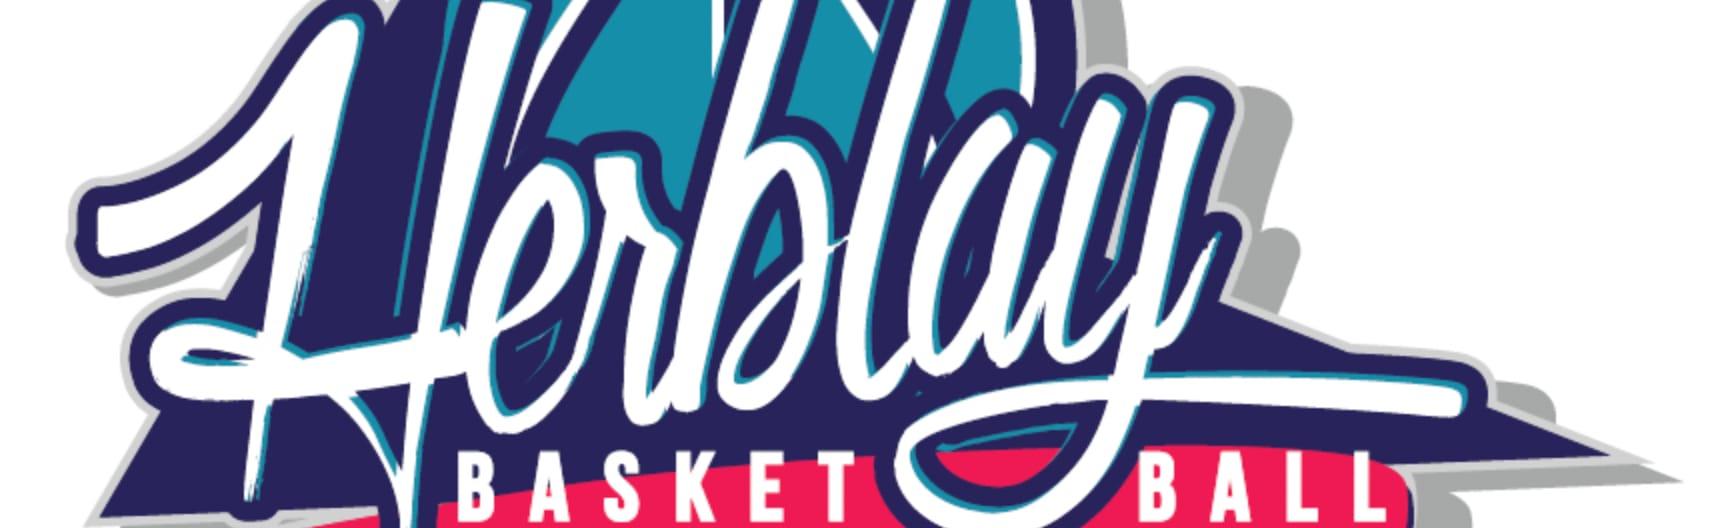 Herblay Basket Club